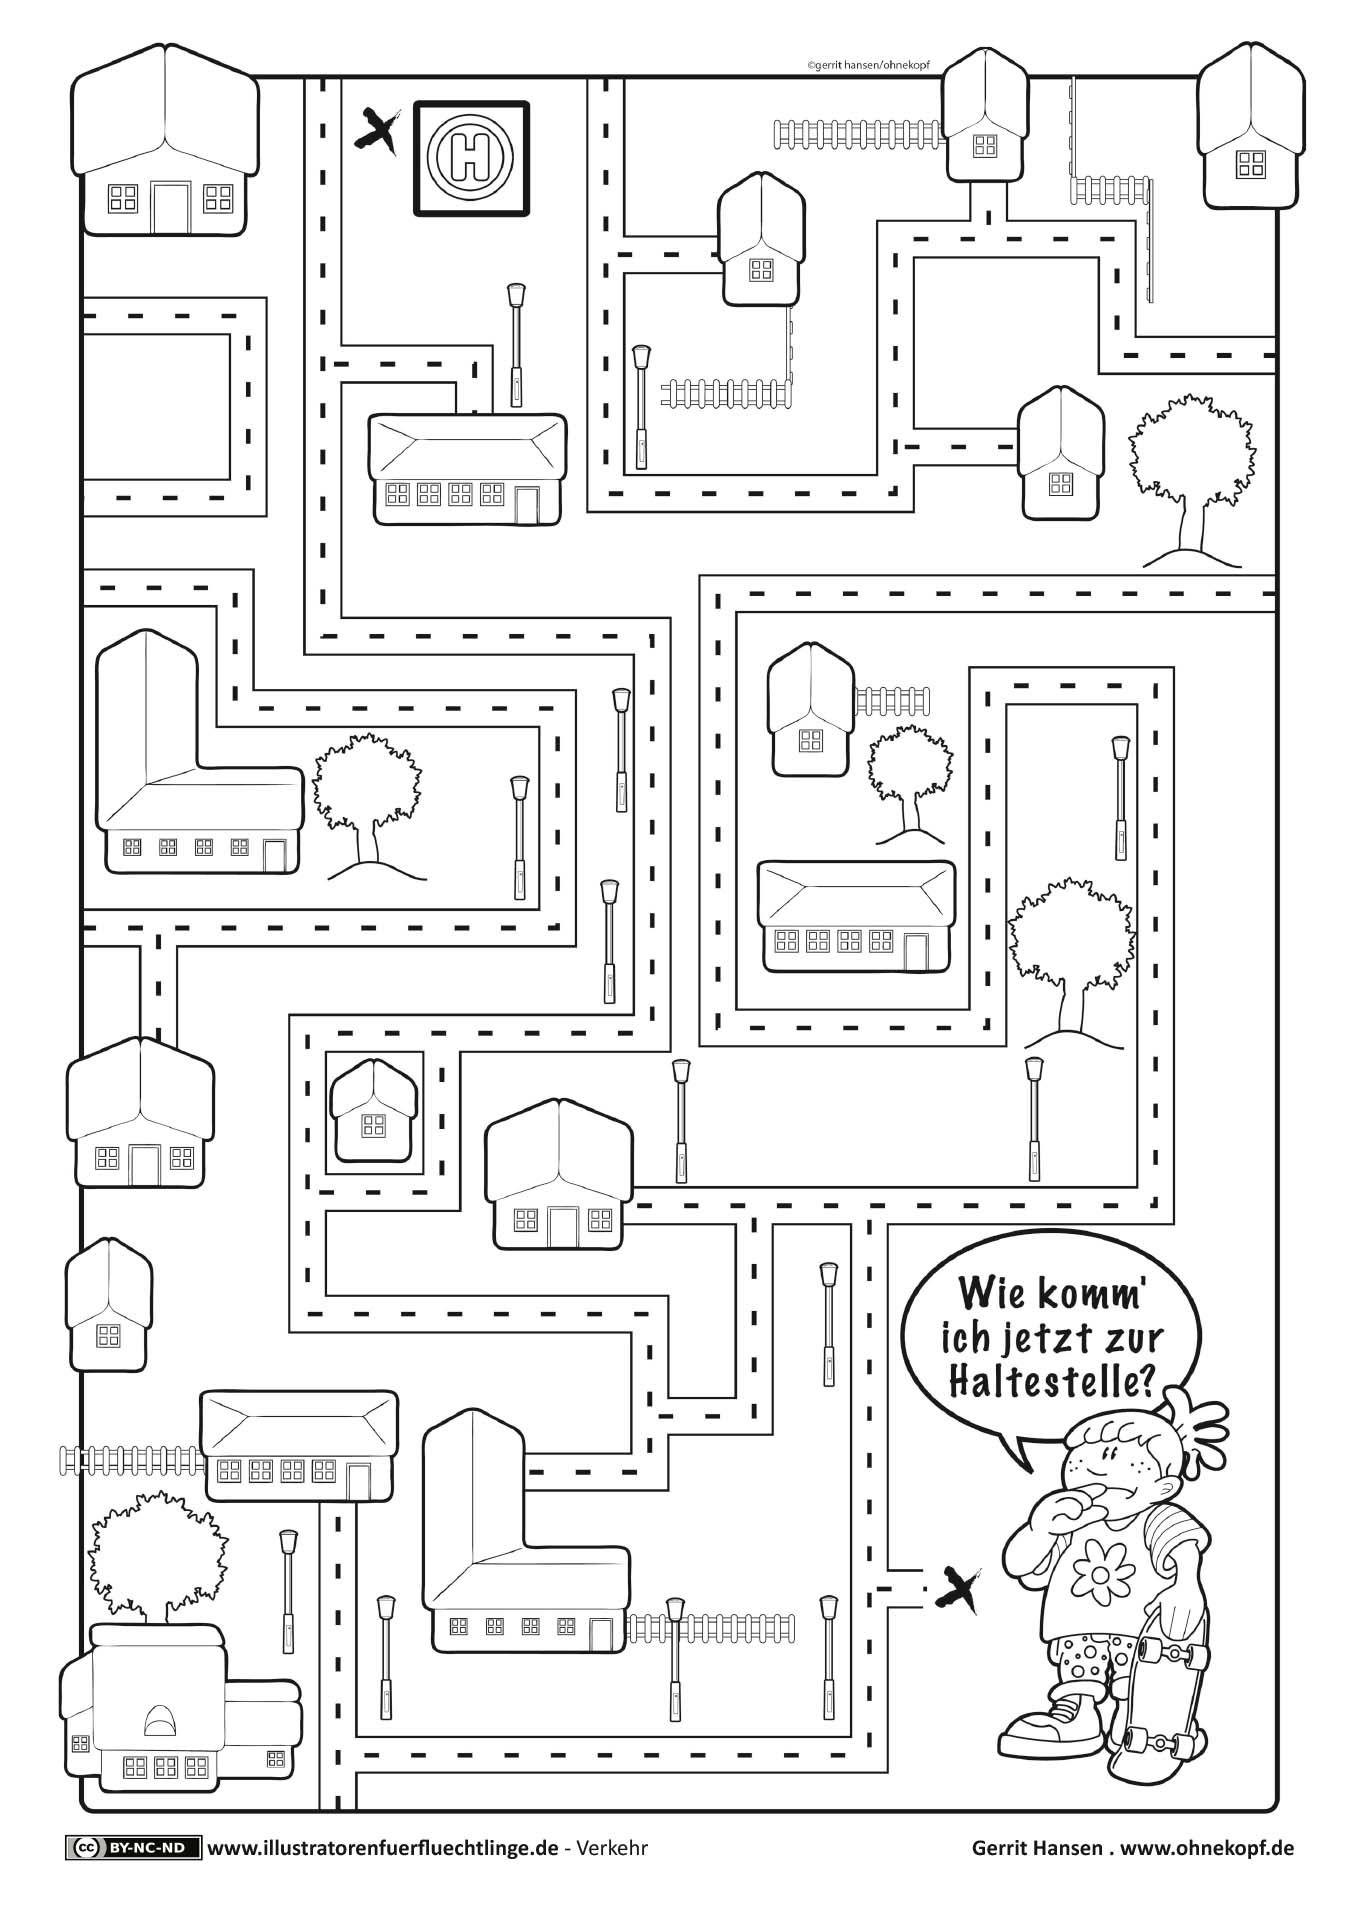 download als pdf verkehr labyrinth hansen hauptschule pinterest verkehrserziehung. Black Bedroom Furniture Sets. Home Design Ideas